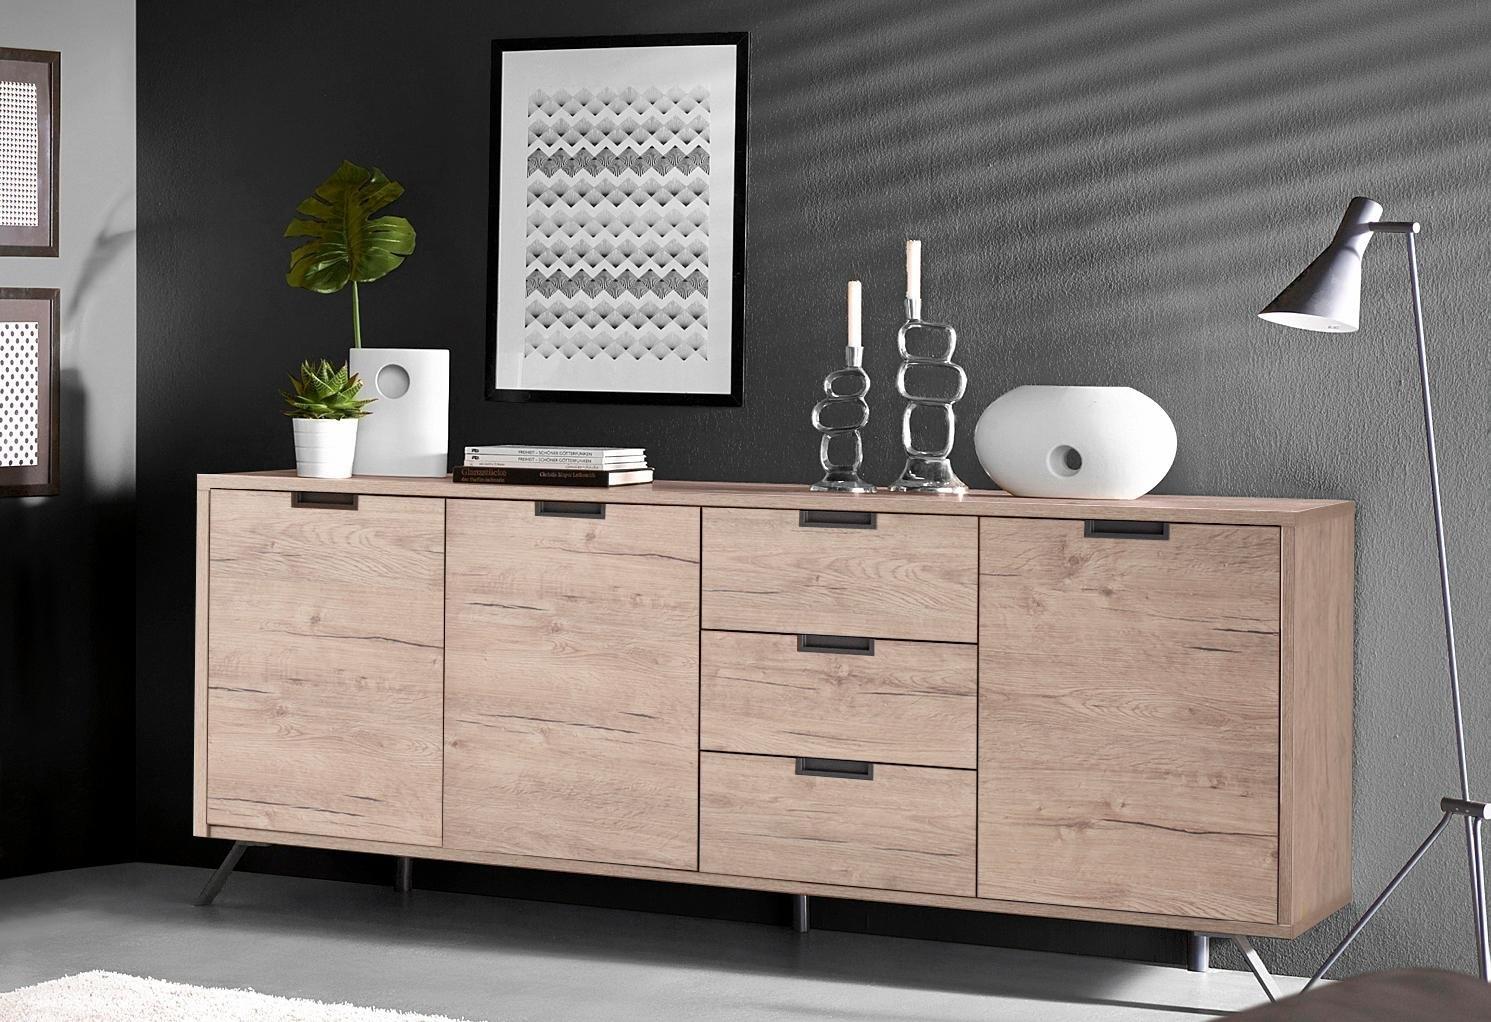 LC dressoir Palma breedte 206 cm nu online kopen bij OTTO